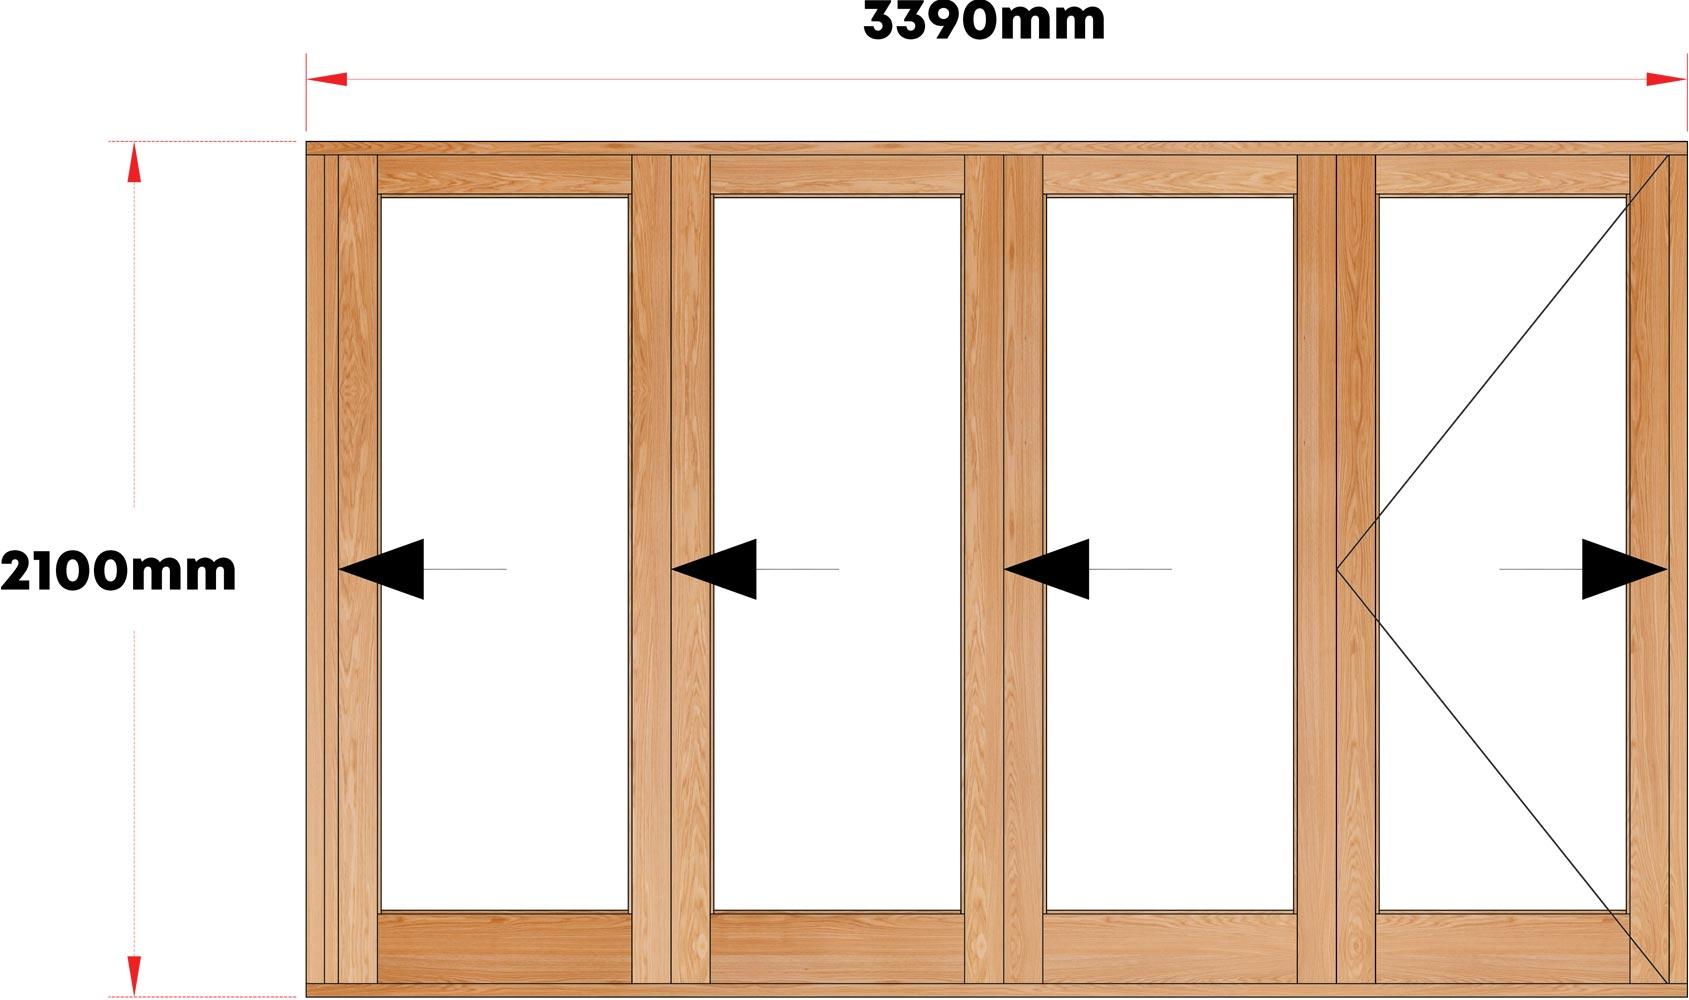 Van Acht Wood Folding Doors Full Pane Model VSF3390G1 fixed